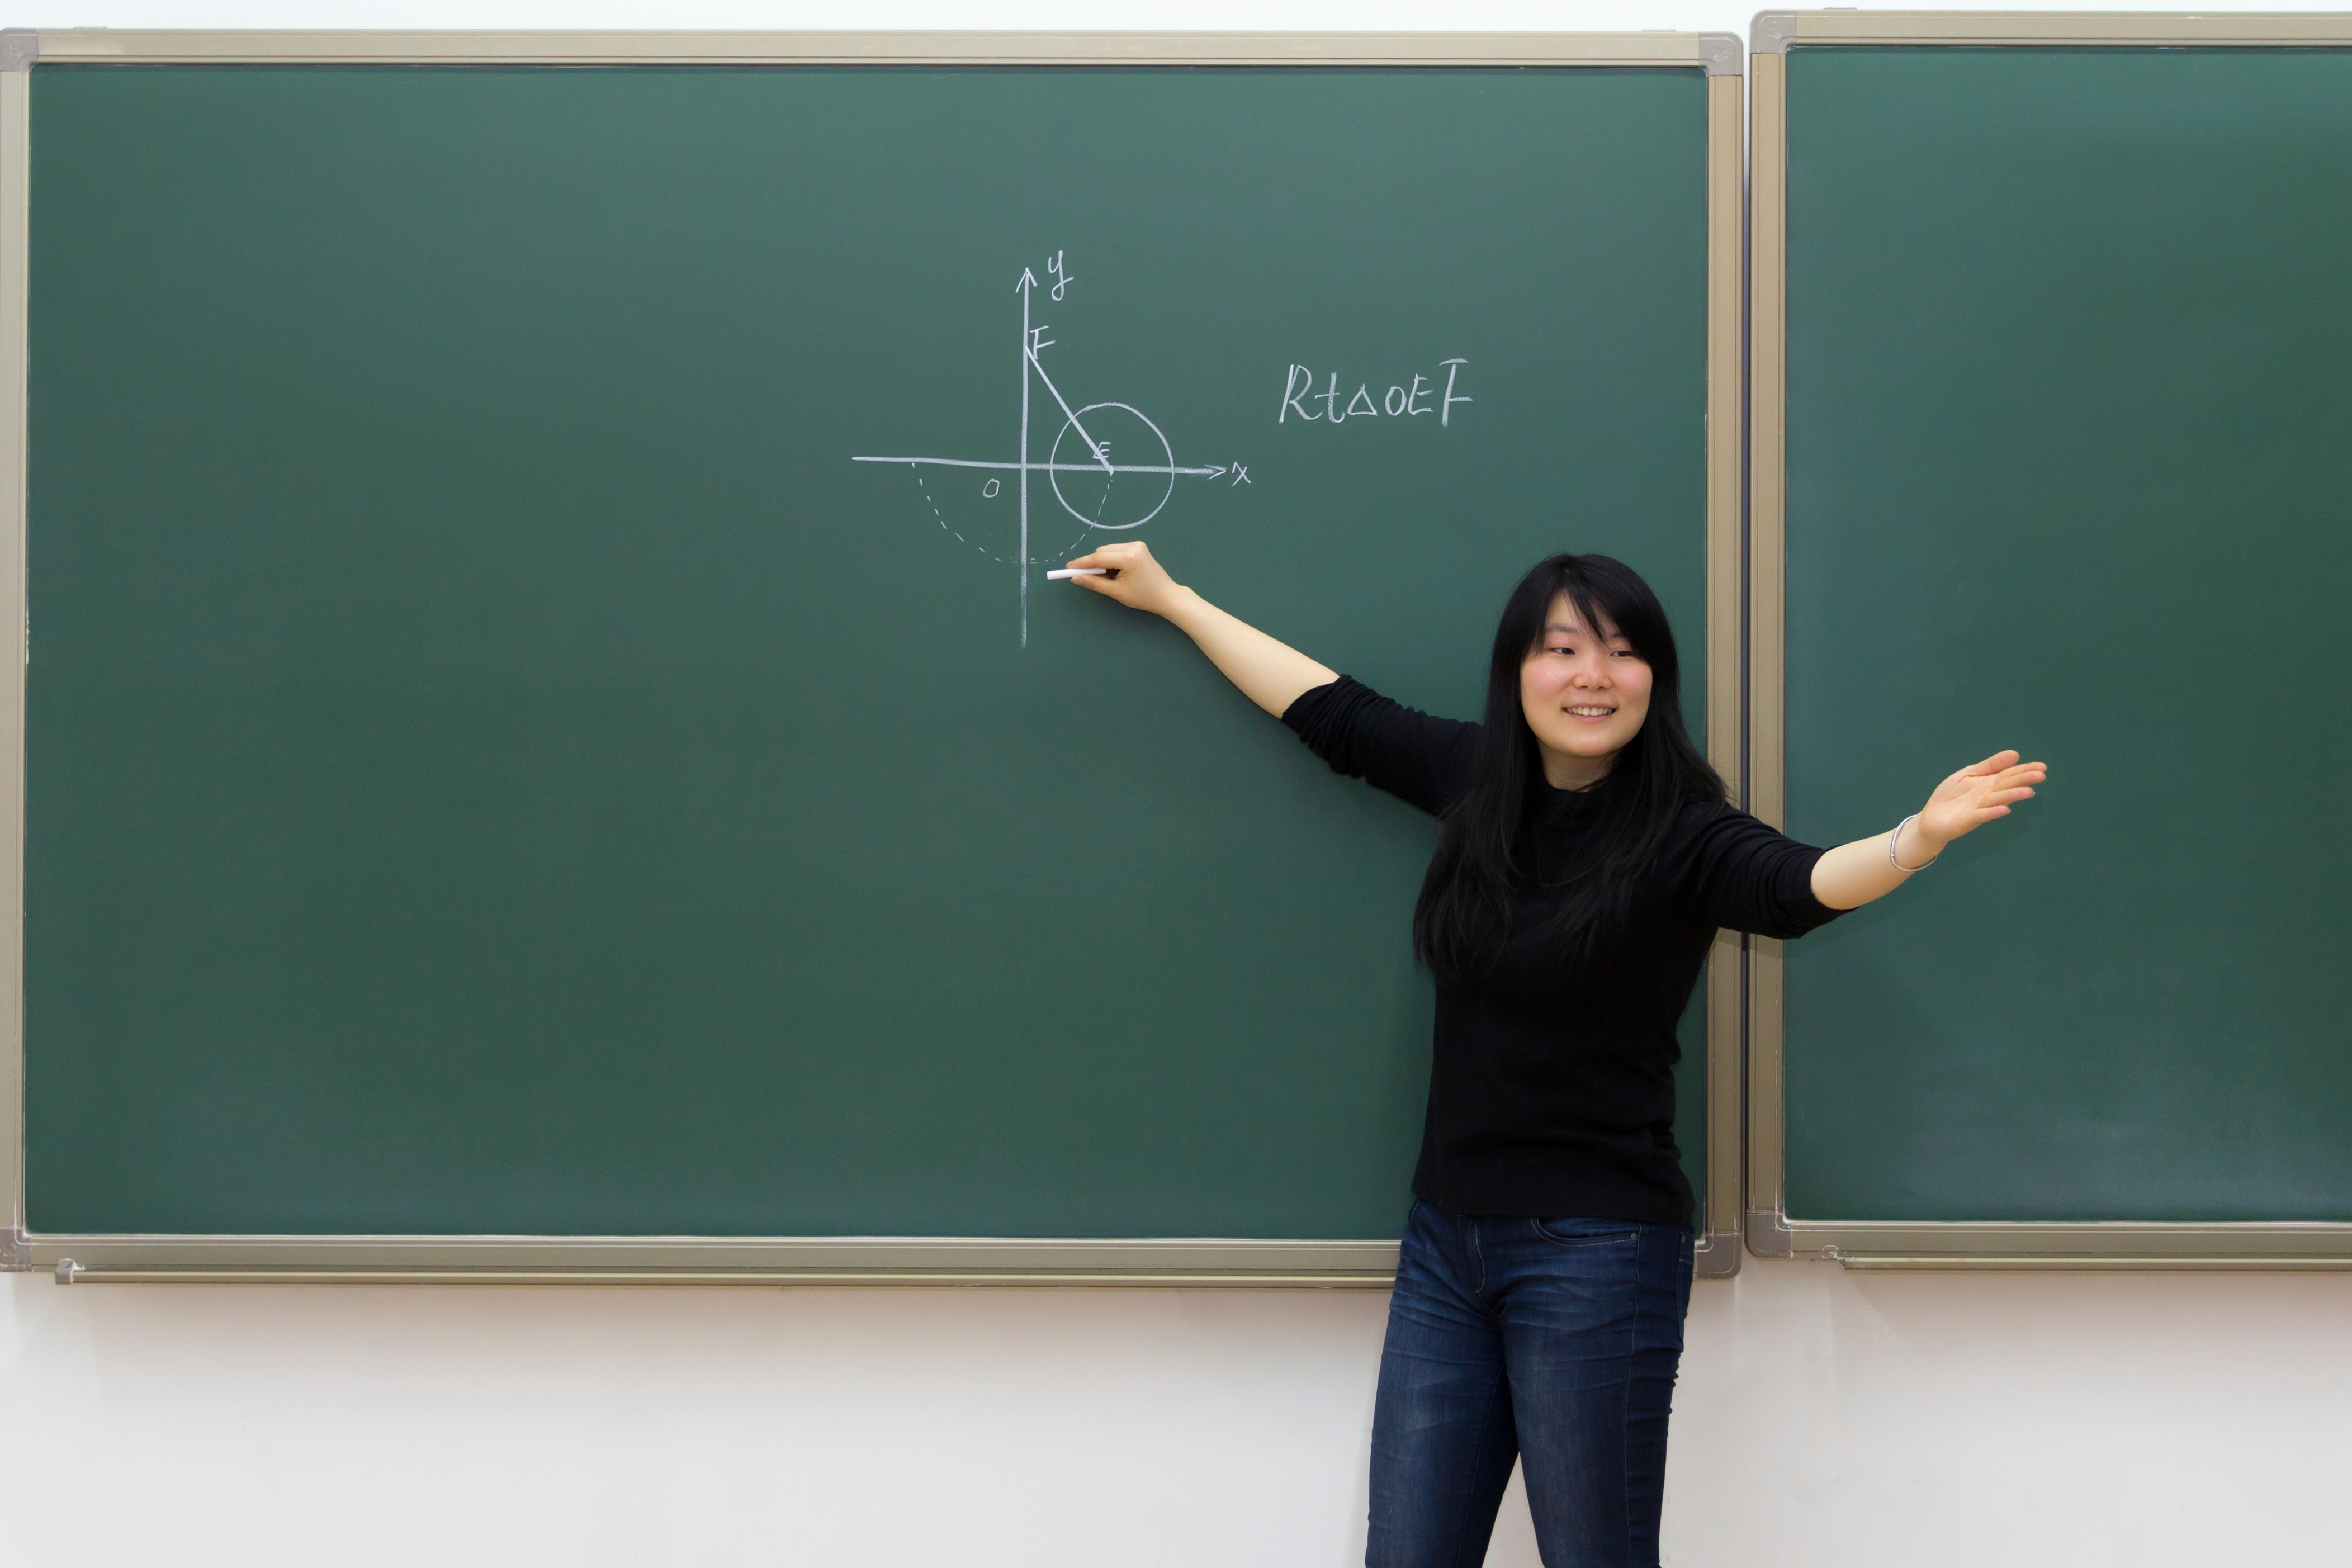 Keeping Your Teaching Fresh